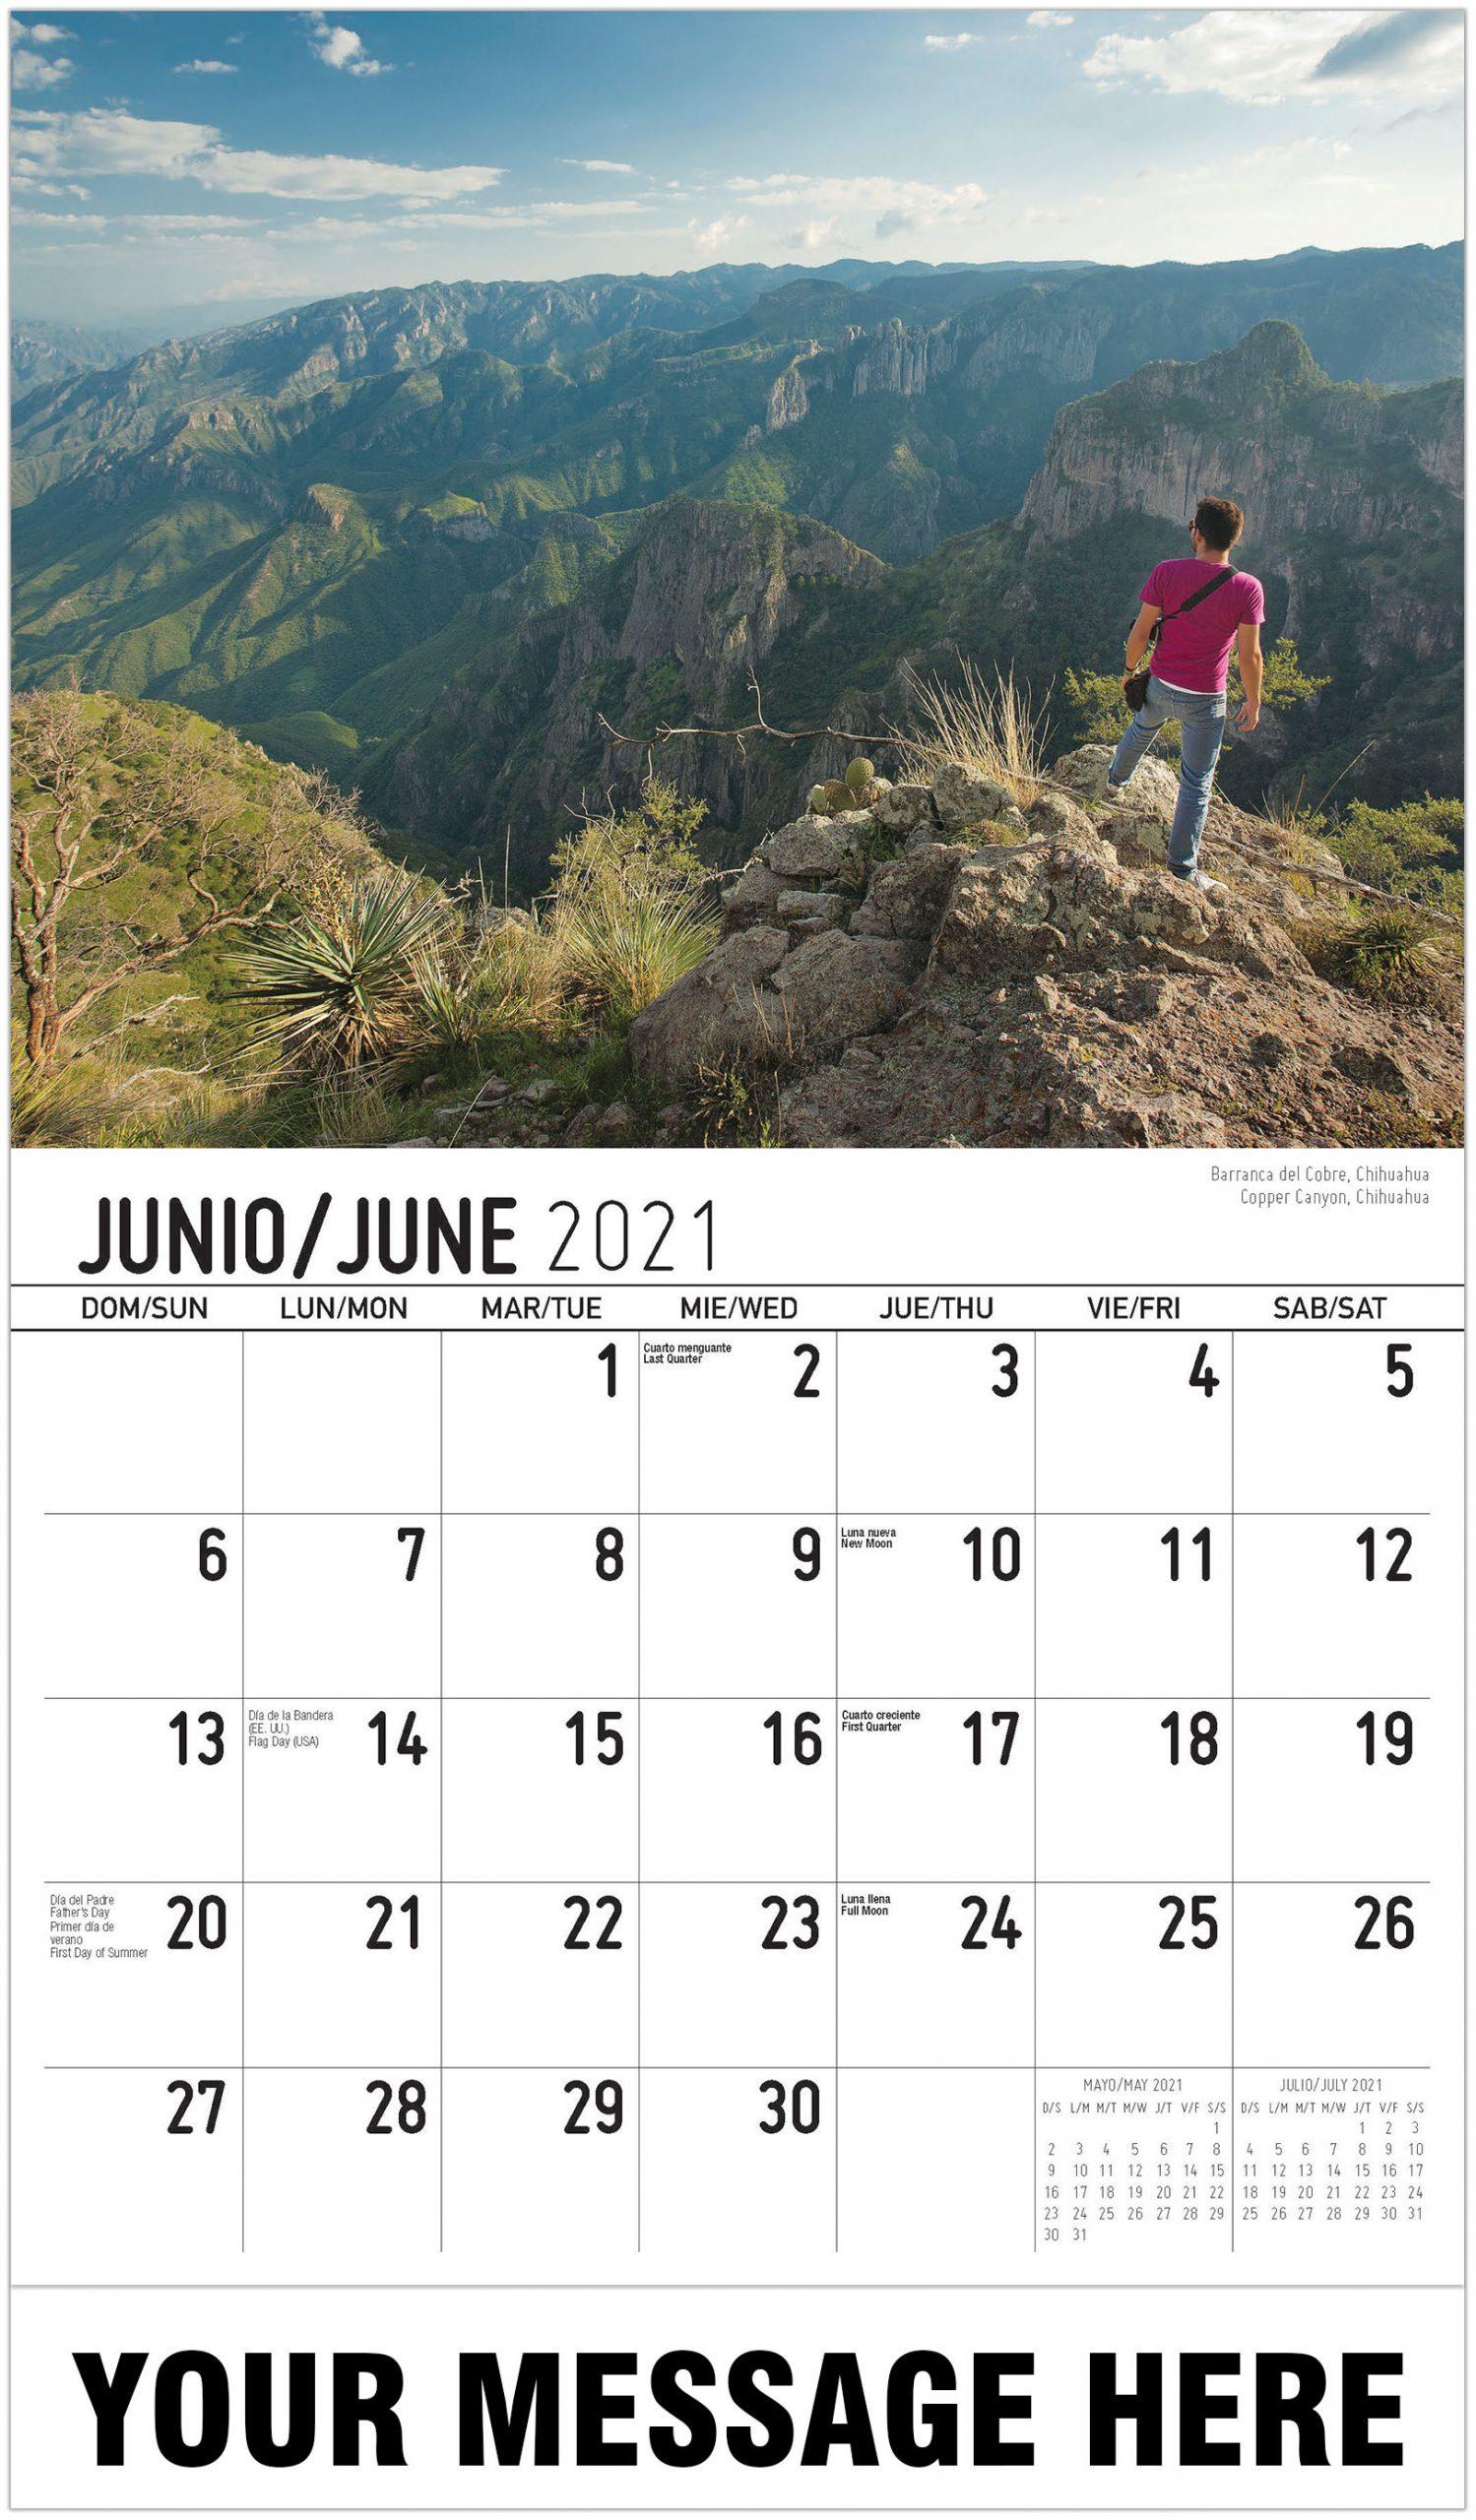 Davidson County Tn School 2021 – 2020 Calendar   Printable Inside Davidson County School Calendar 2021